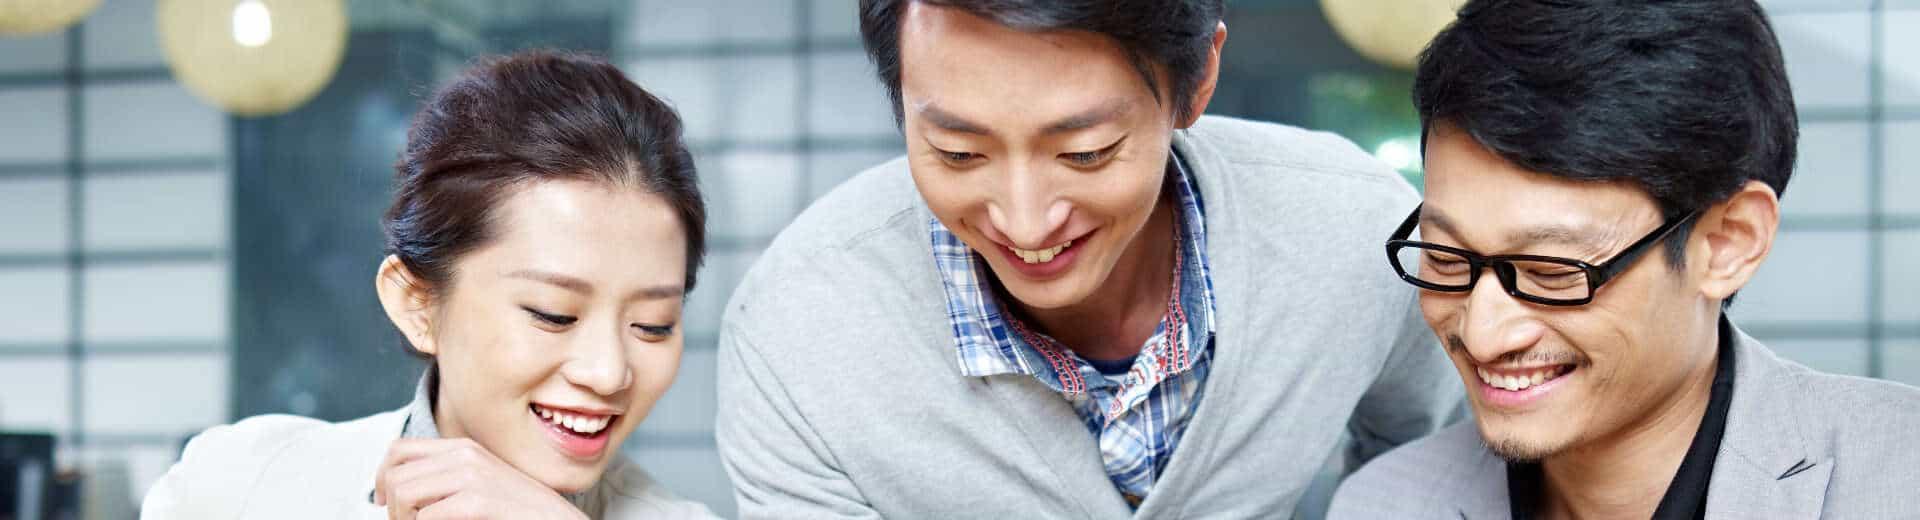 subheader_advertise_asian_smile